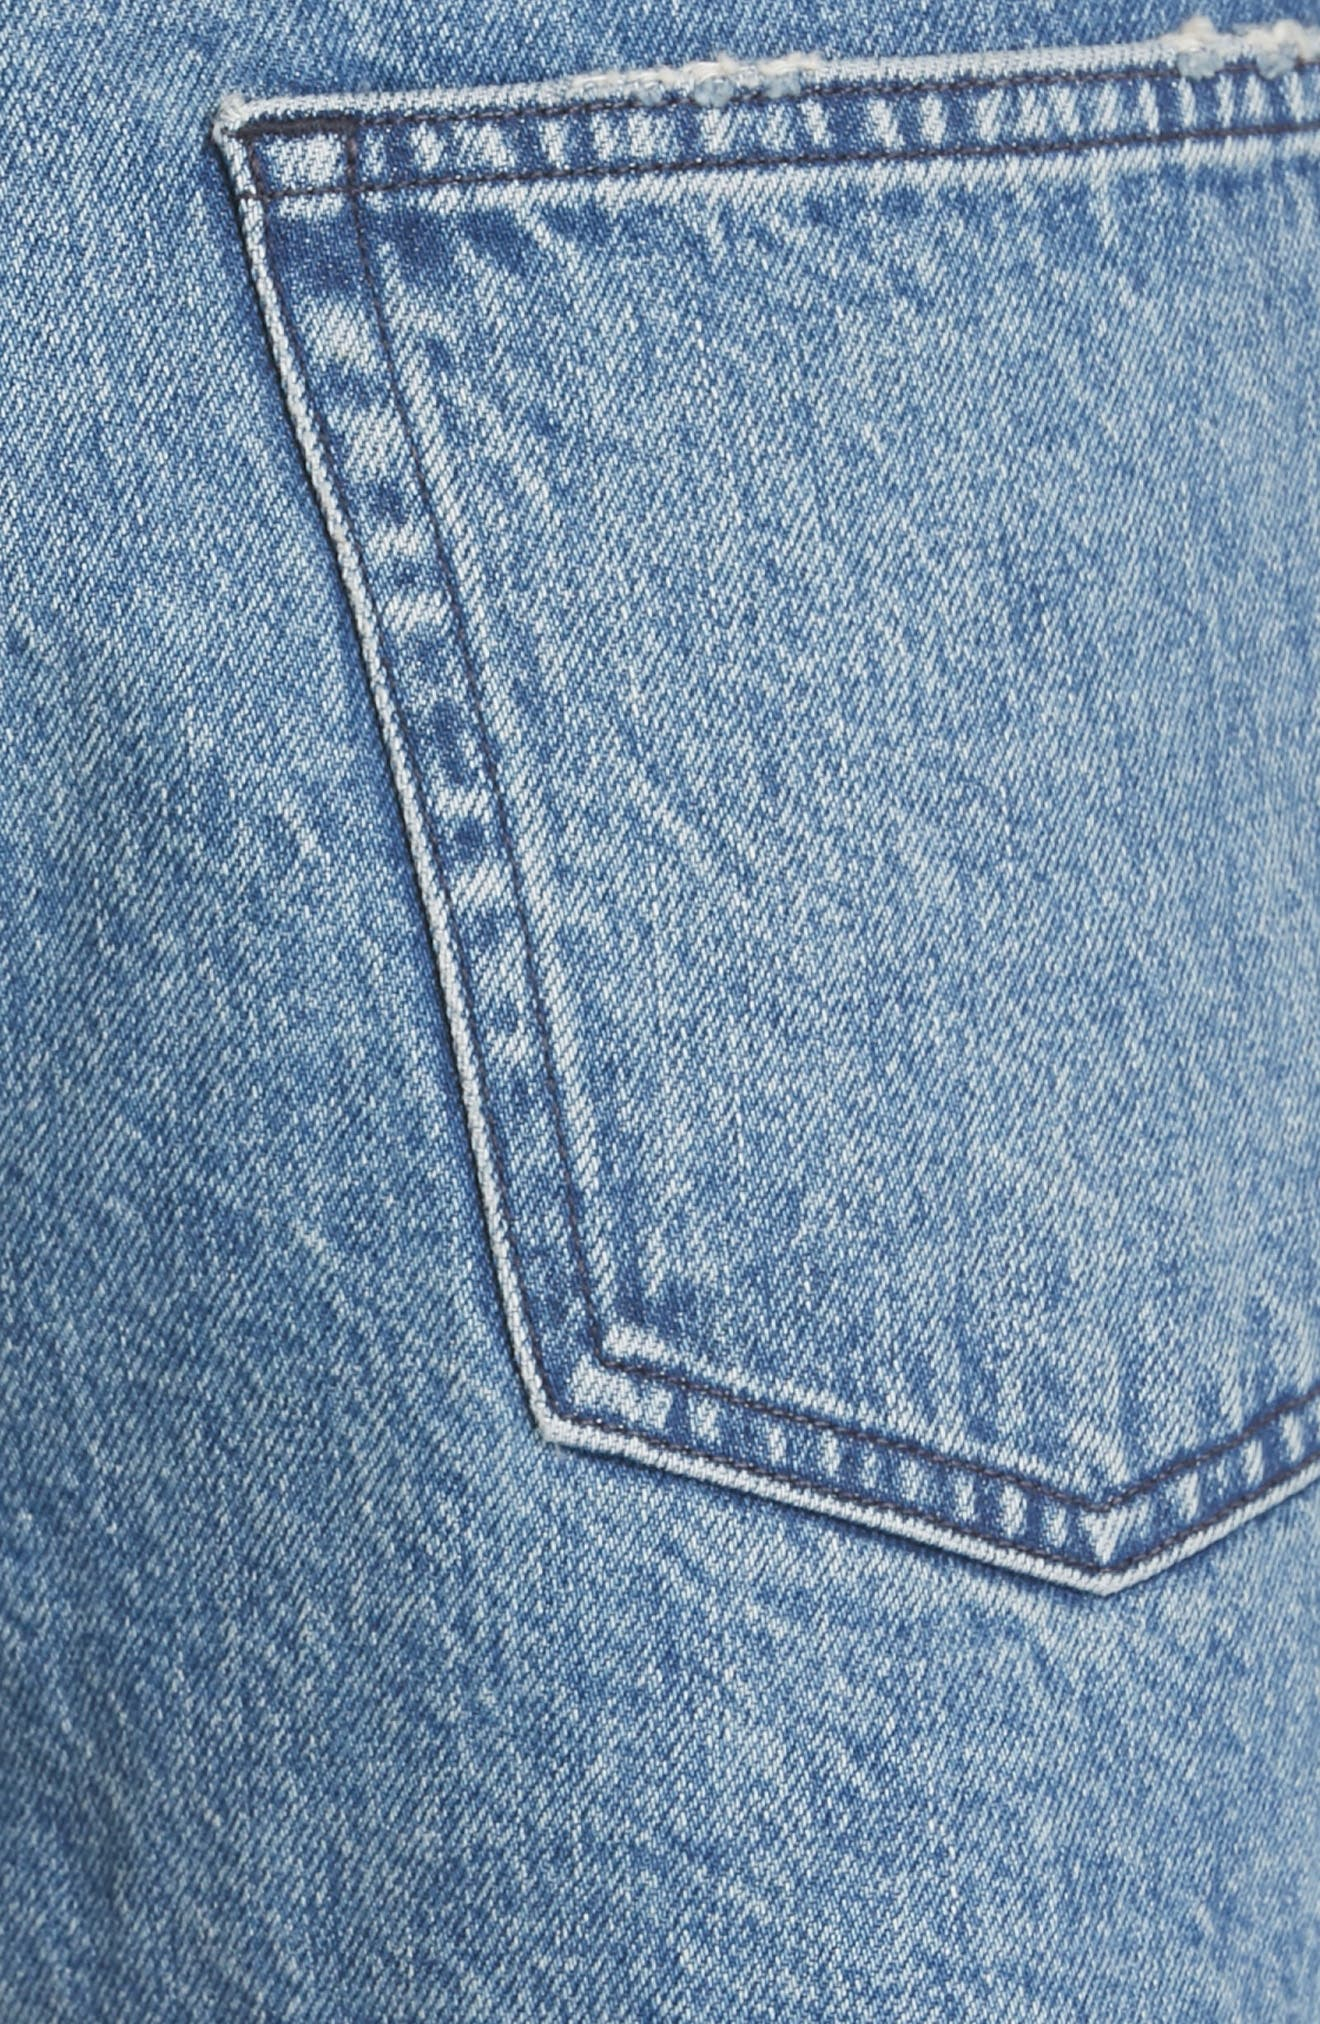 W4 Carter Ripped High Waist Denim Shorts,                             Alternate thumbnail 5, color,                             421